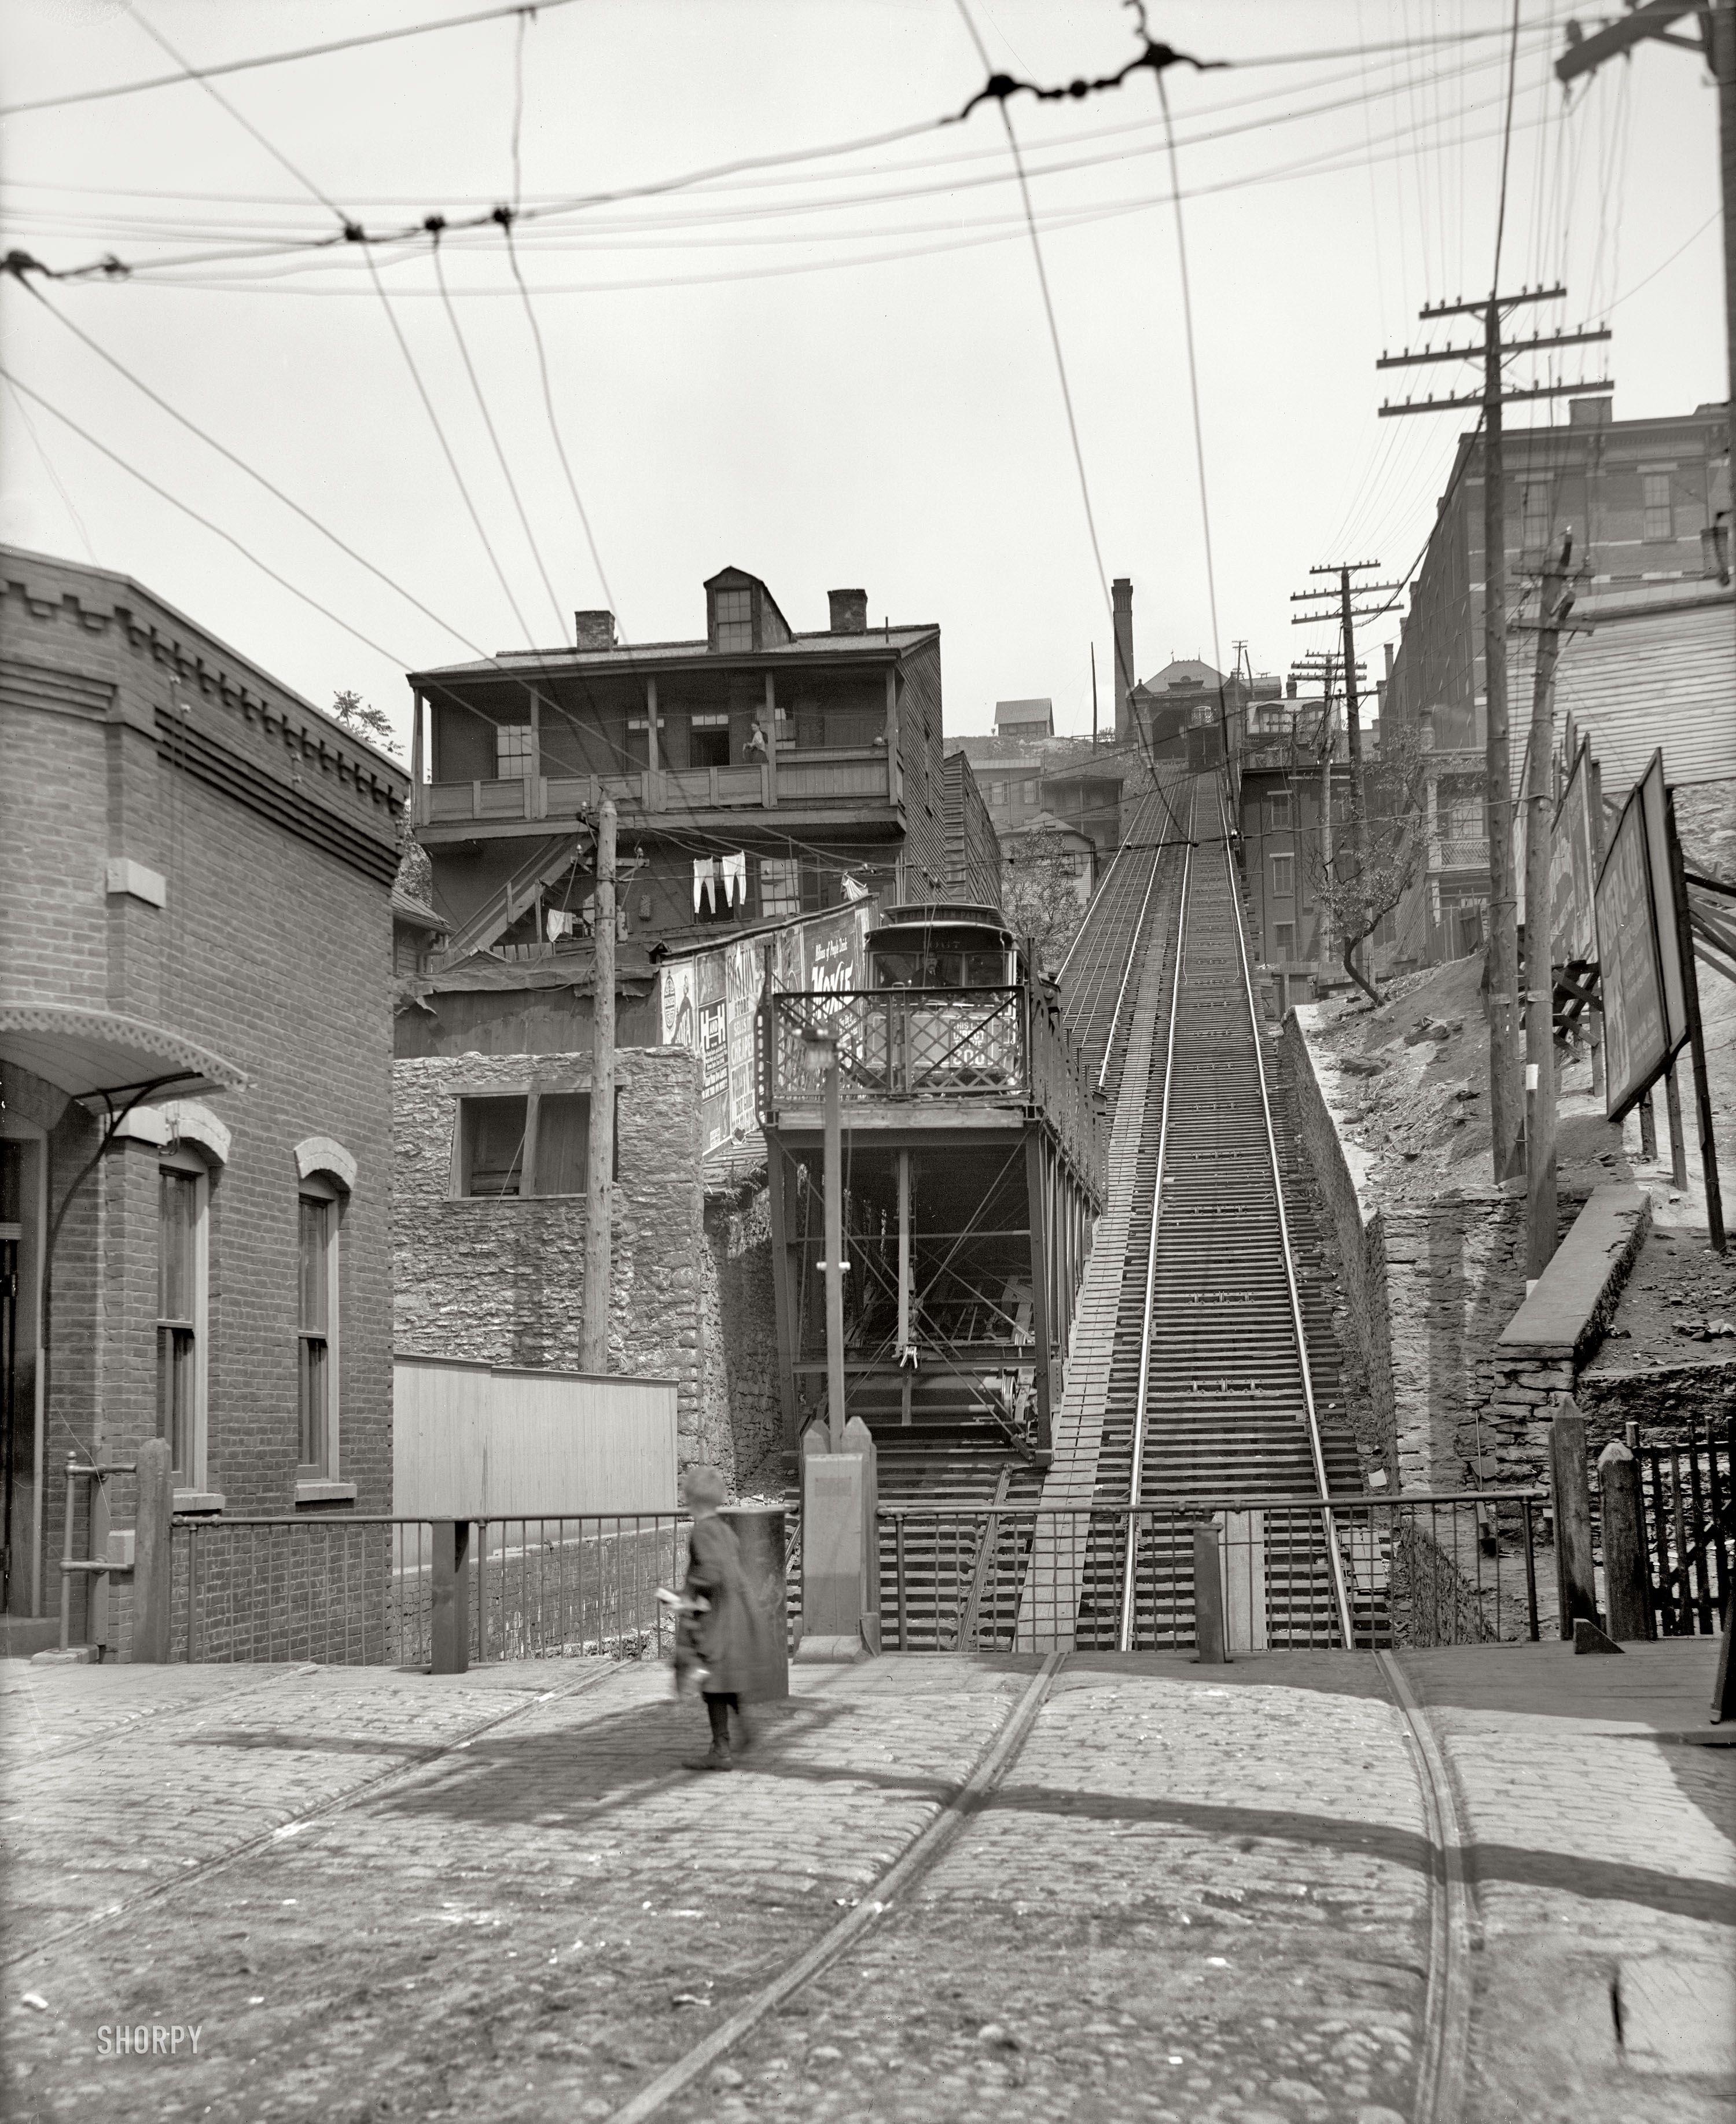 Shorpy Historic Picture Archive The Underwear Railroad